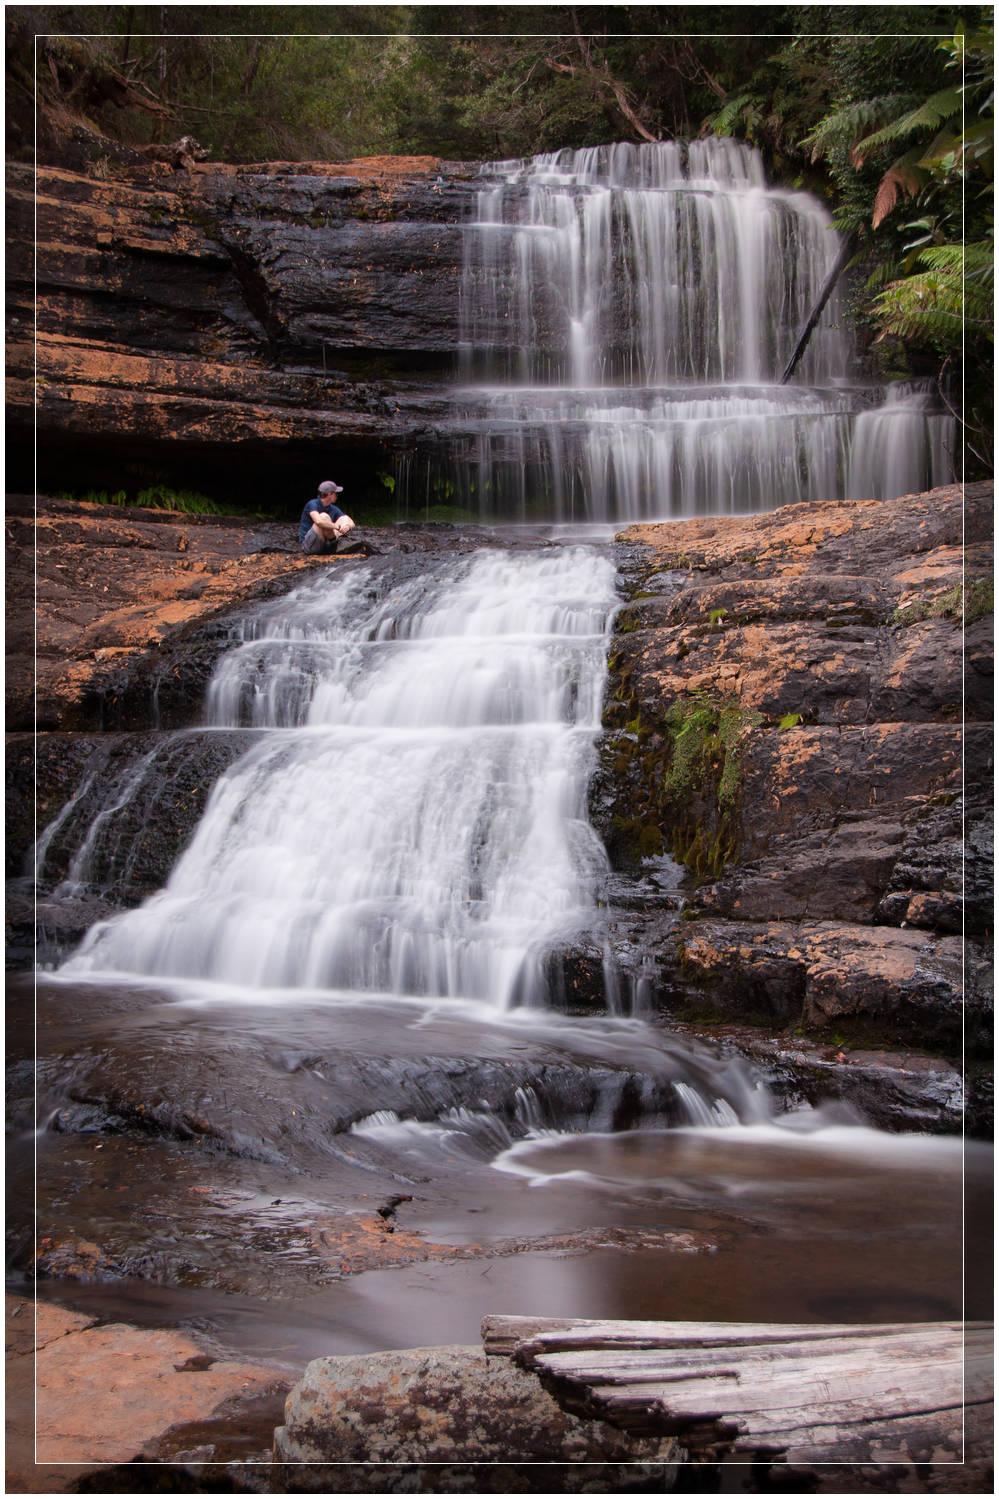 """Up Close with Lady Barron Falls"" Tasmania, Australia"